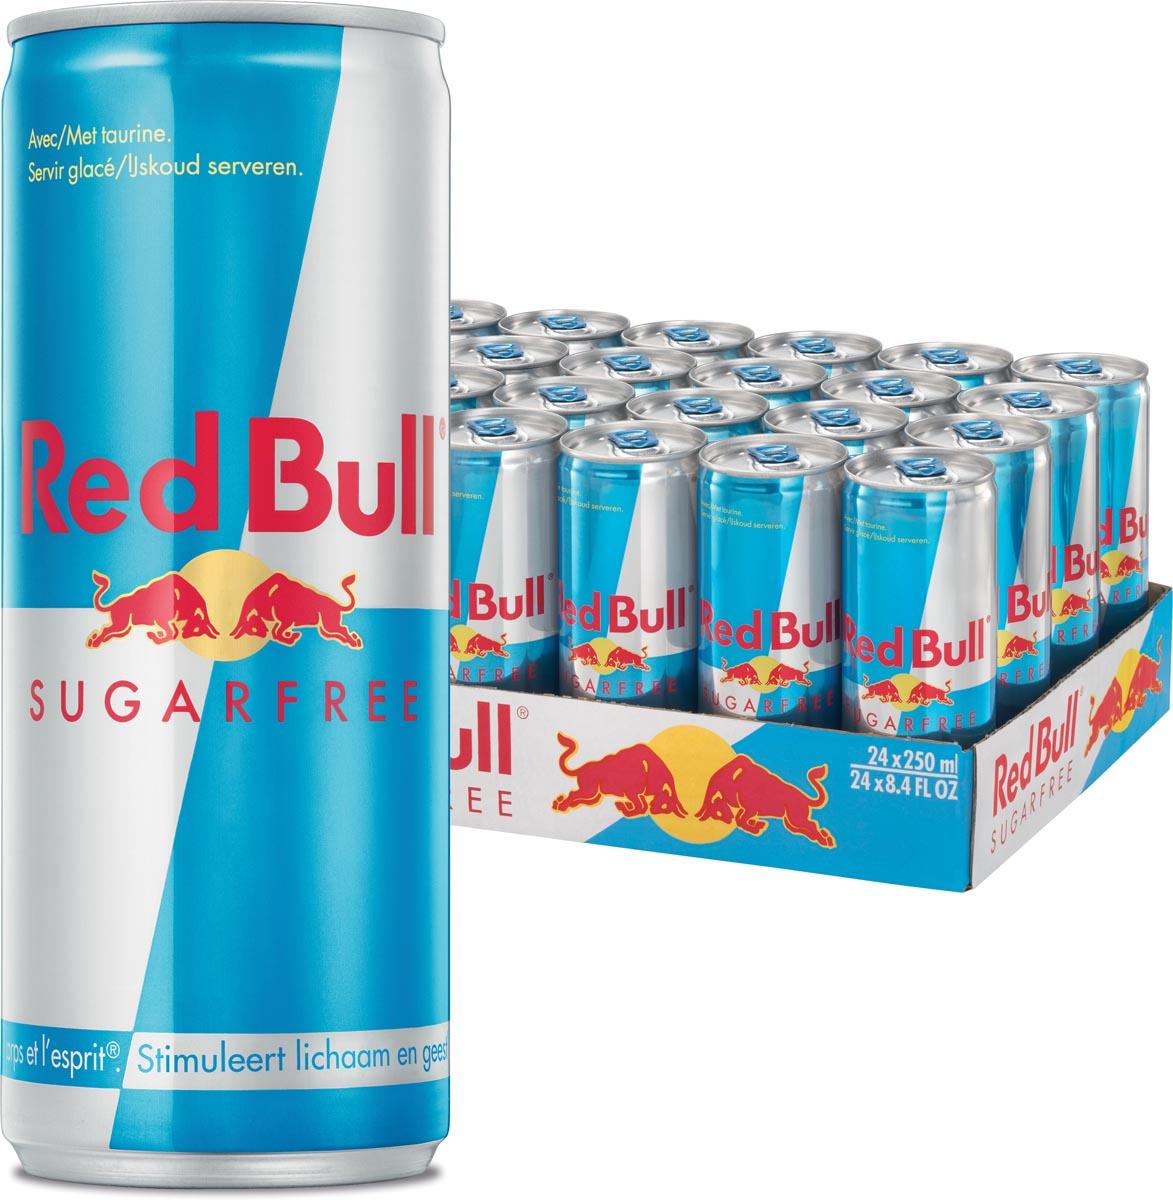 Red bull energiedrank 25 cl, pak van 24 stuks, sugarfree